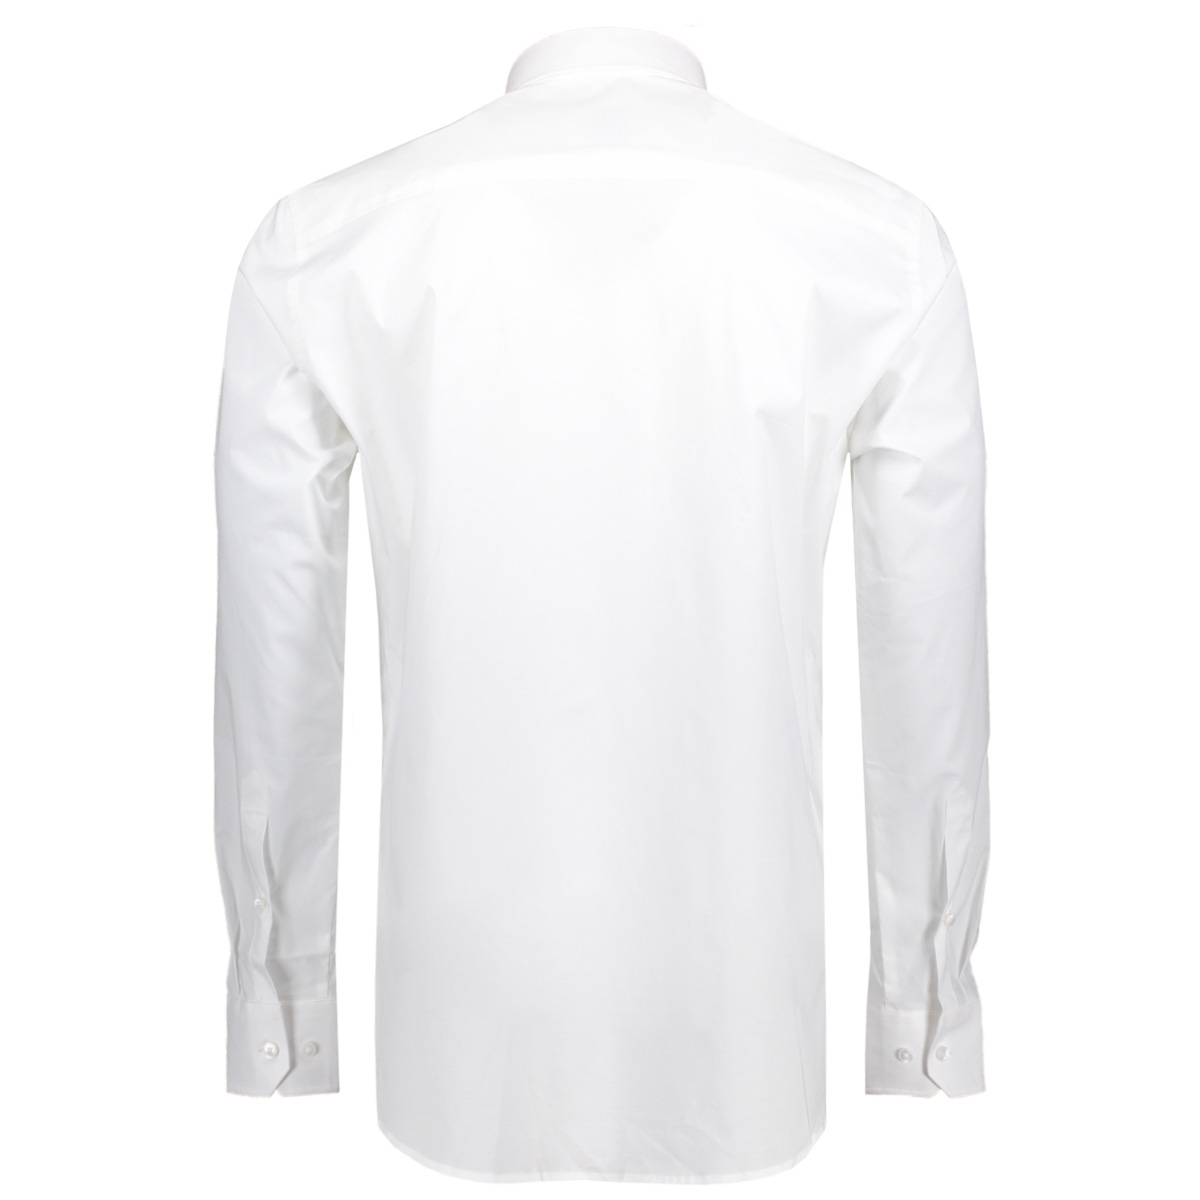 3290 7078 haupt overhemd 02